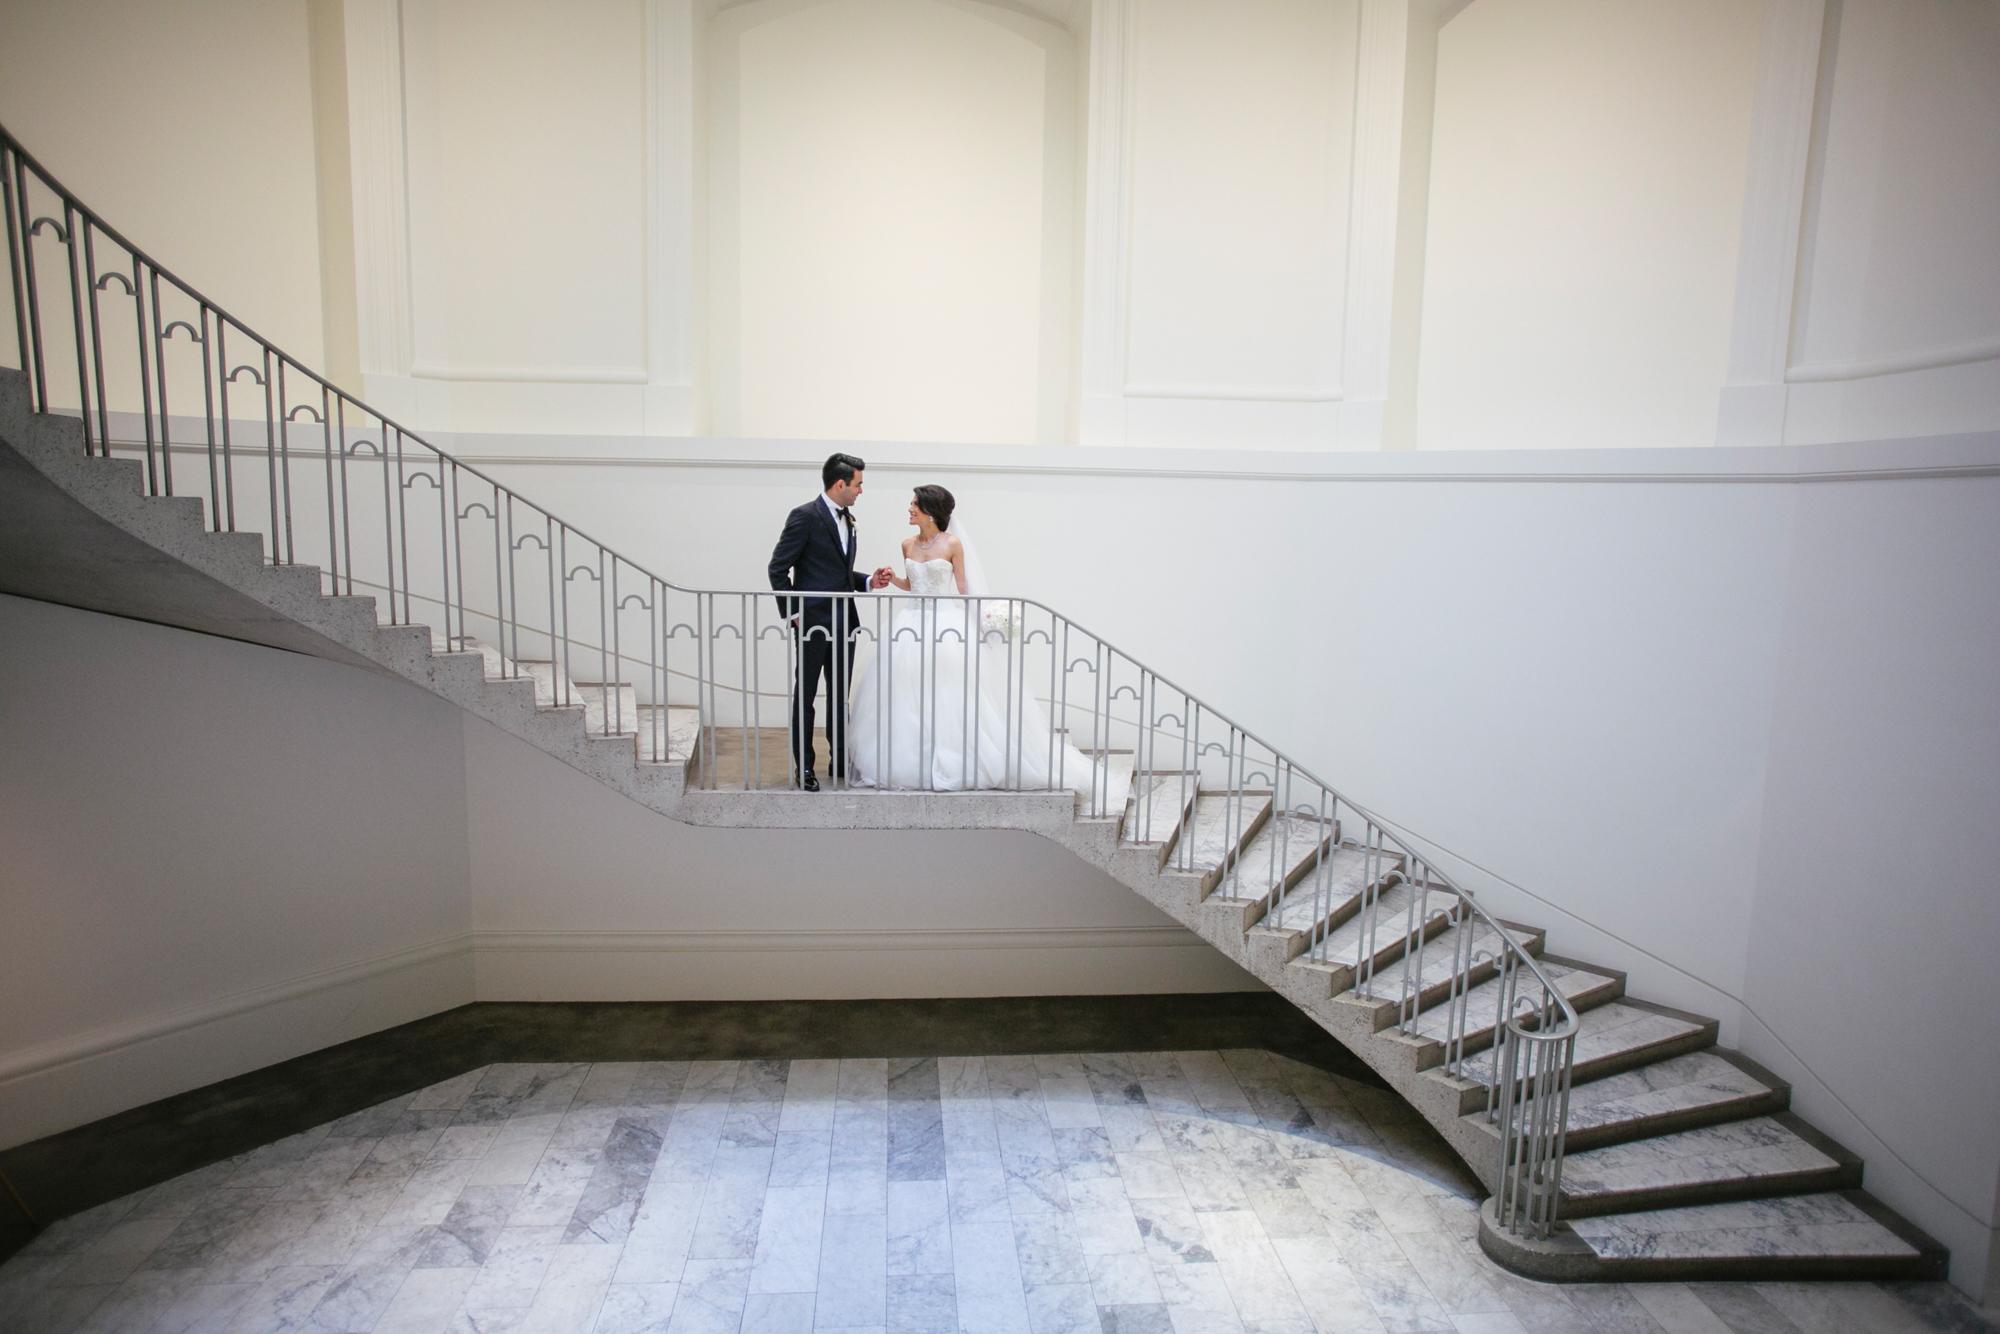 vancouver-luxury-wedding-photographer-lori-miles-0387.jpg